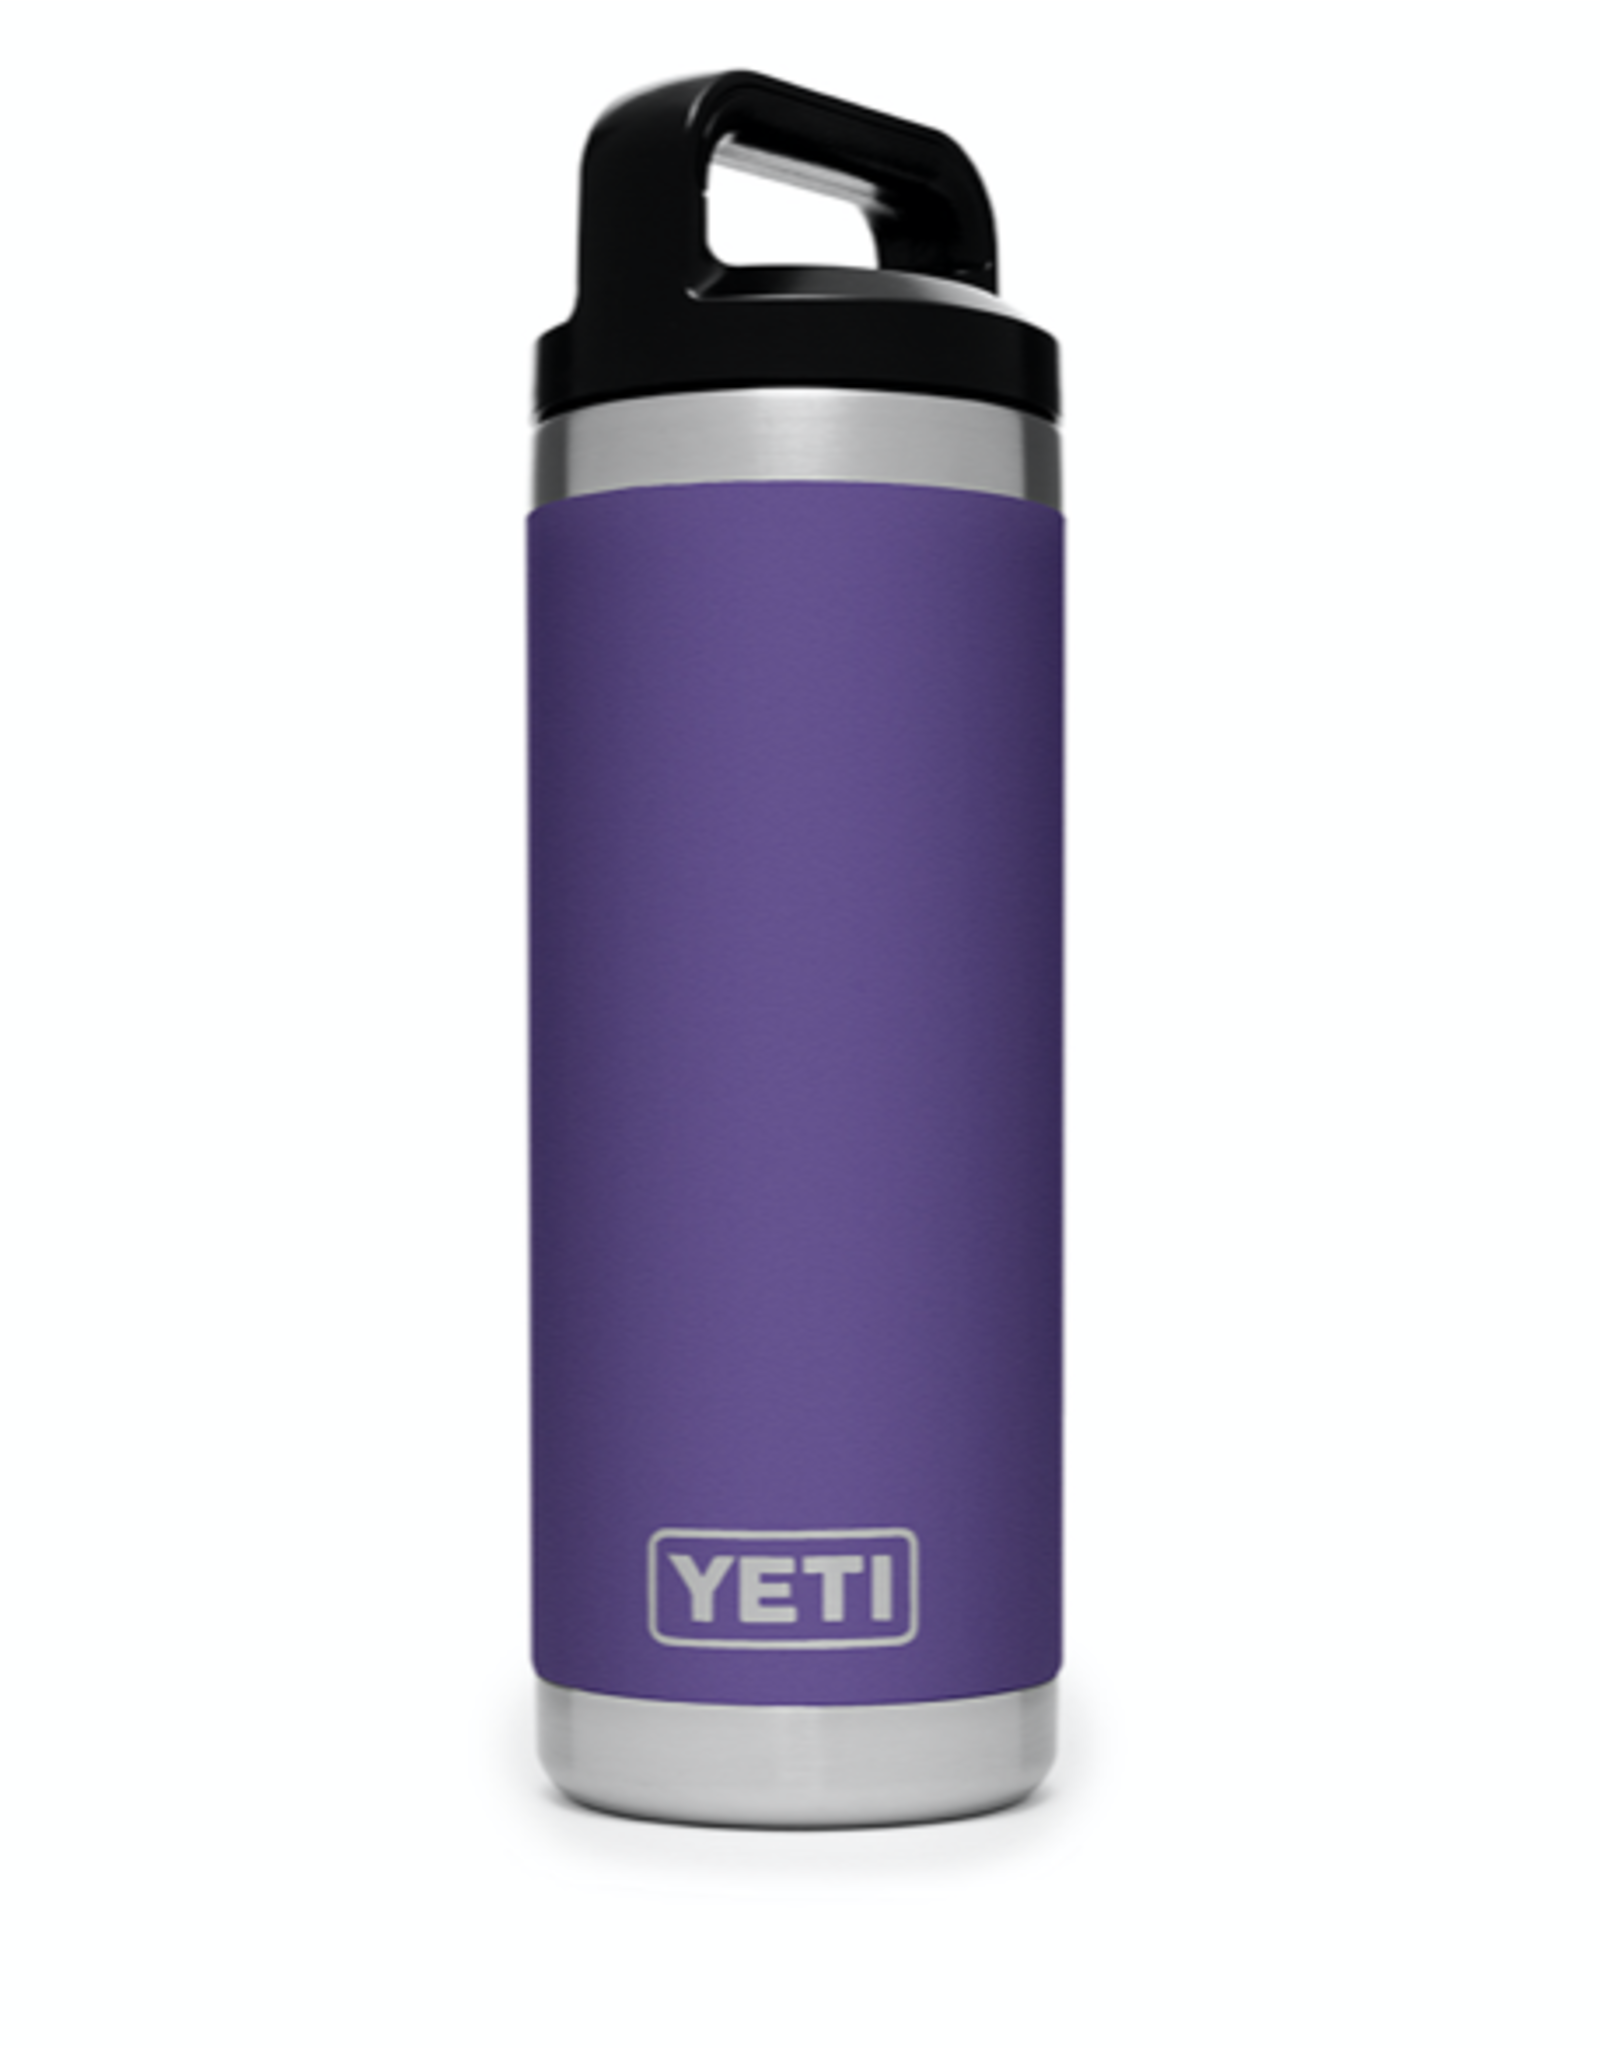 Yeti Rambler 18 Bottle Peak Purple